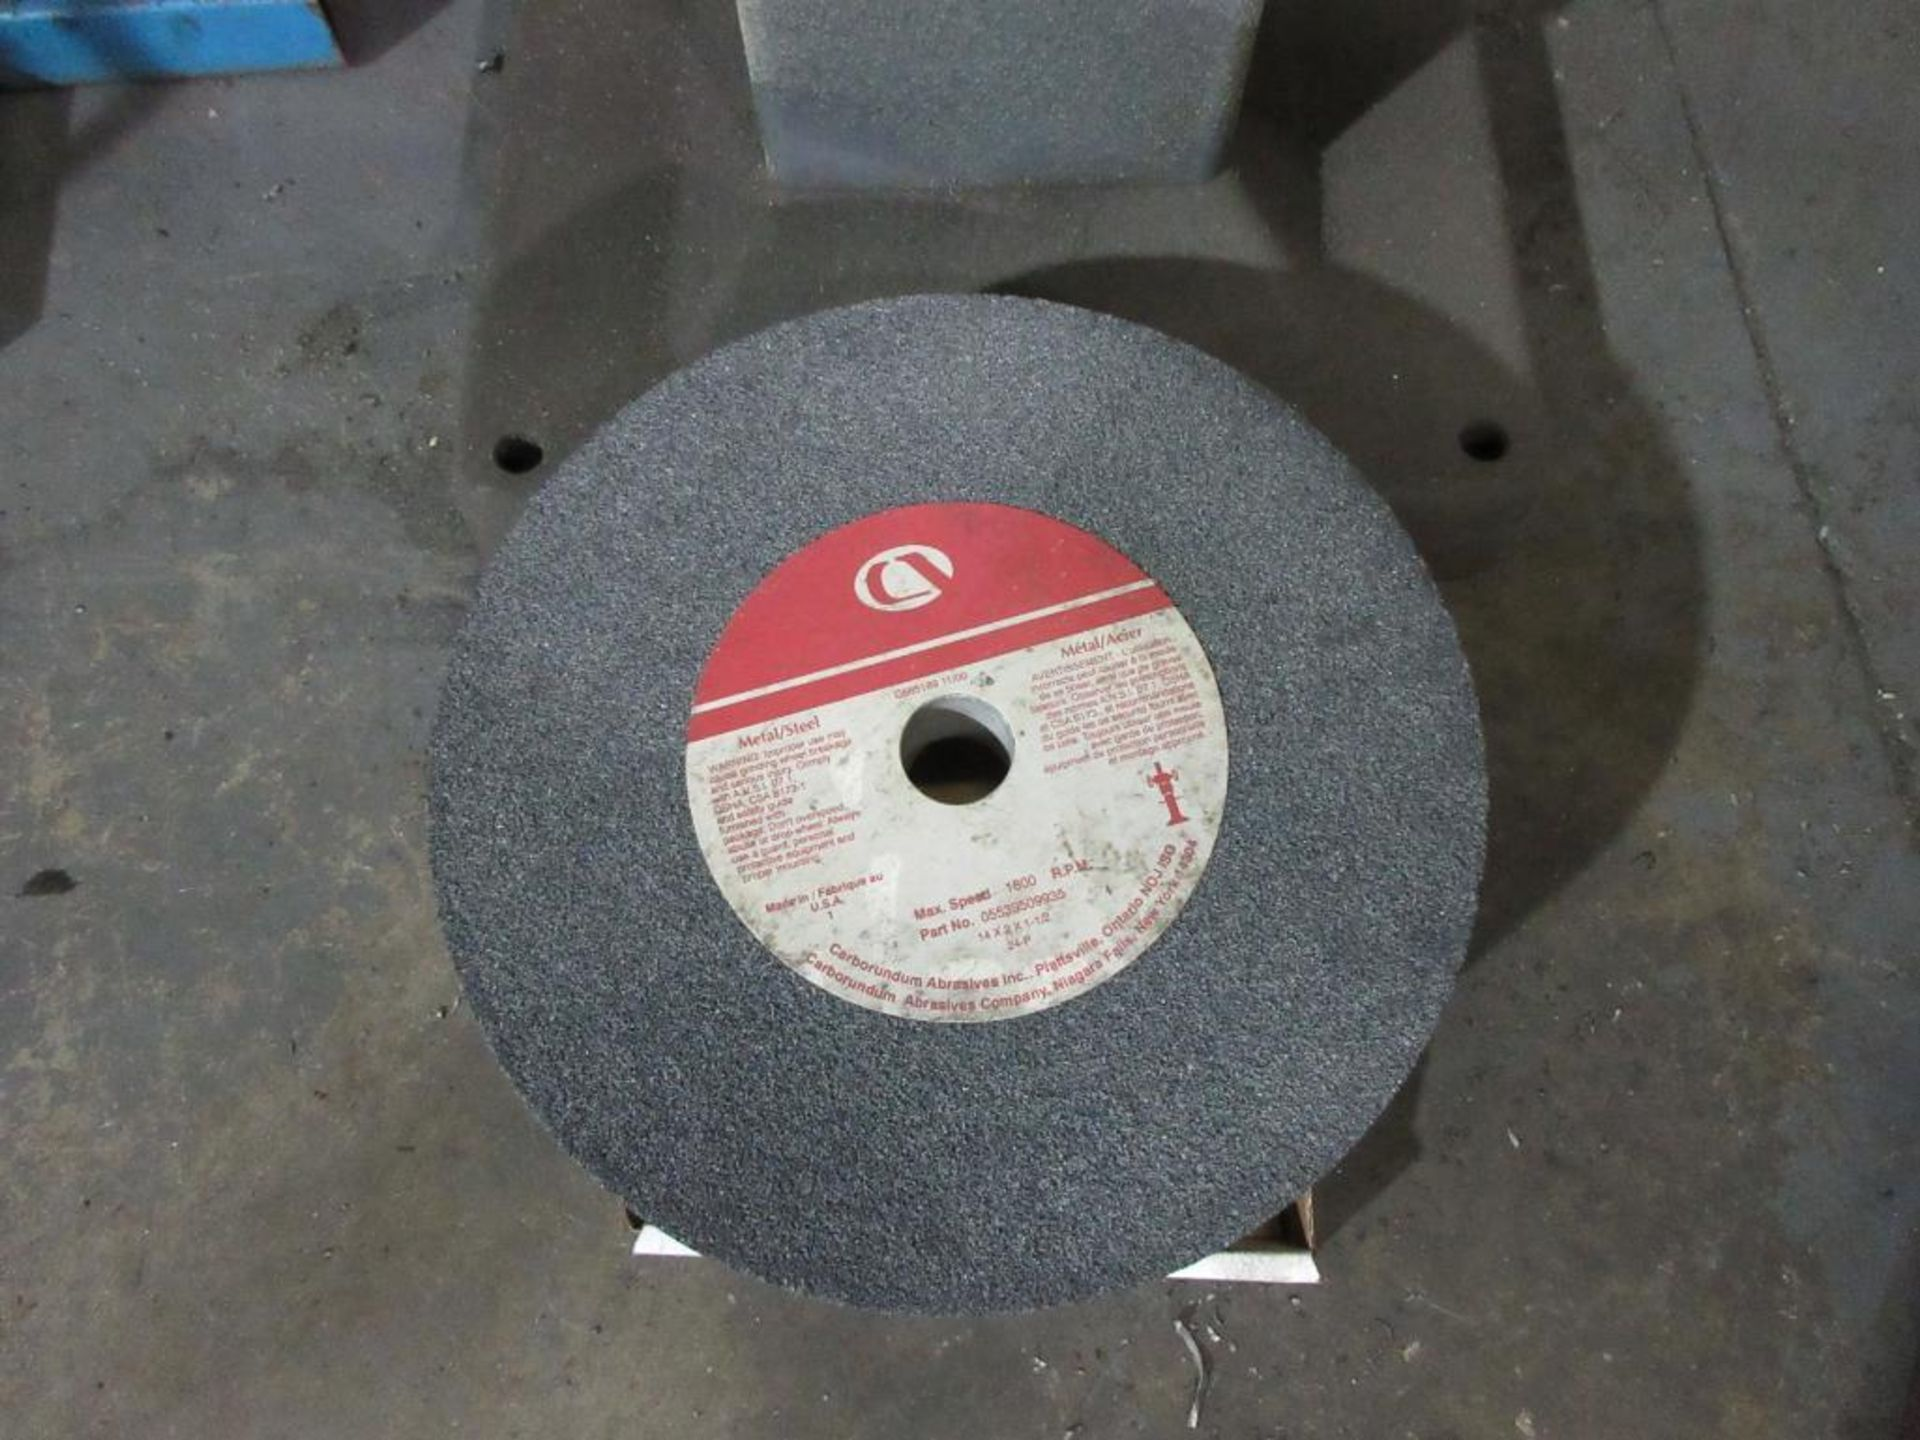 BALDOR DUAL PEDESTAL GRINDER 3 HP, SPARE GRINDING WHEEL - Image 4 of 4